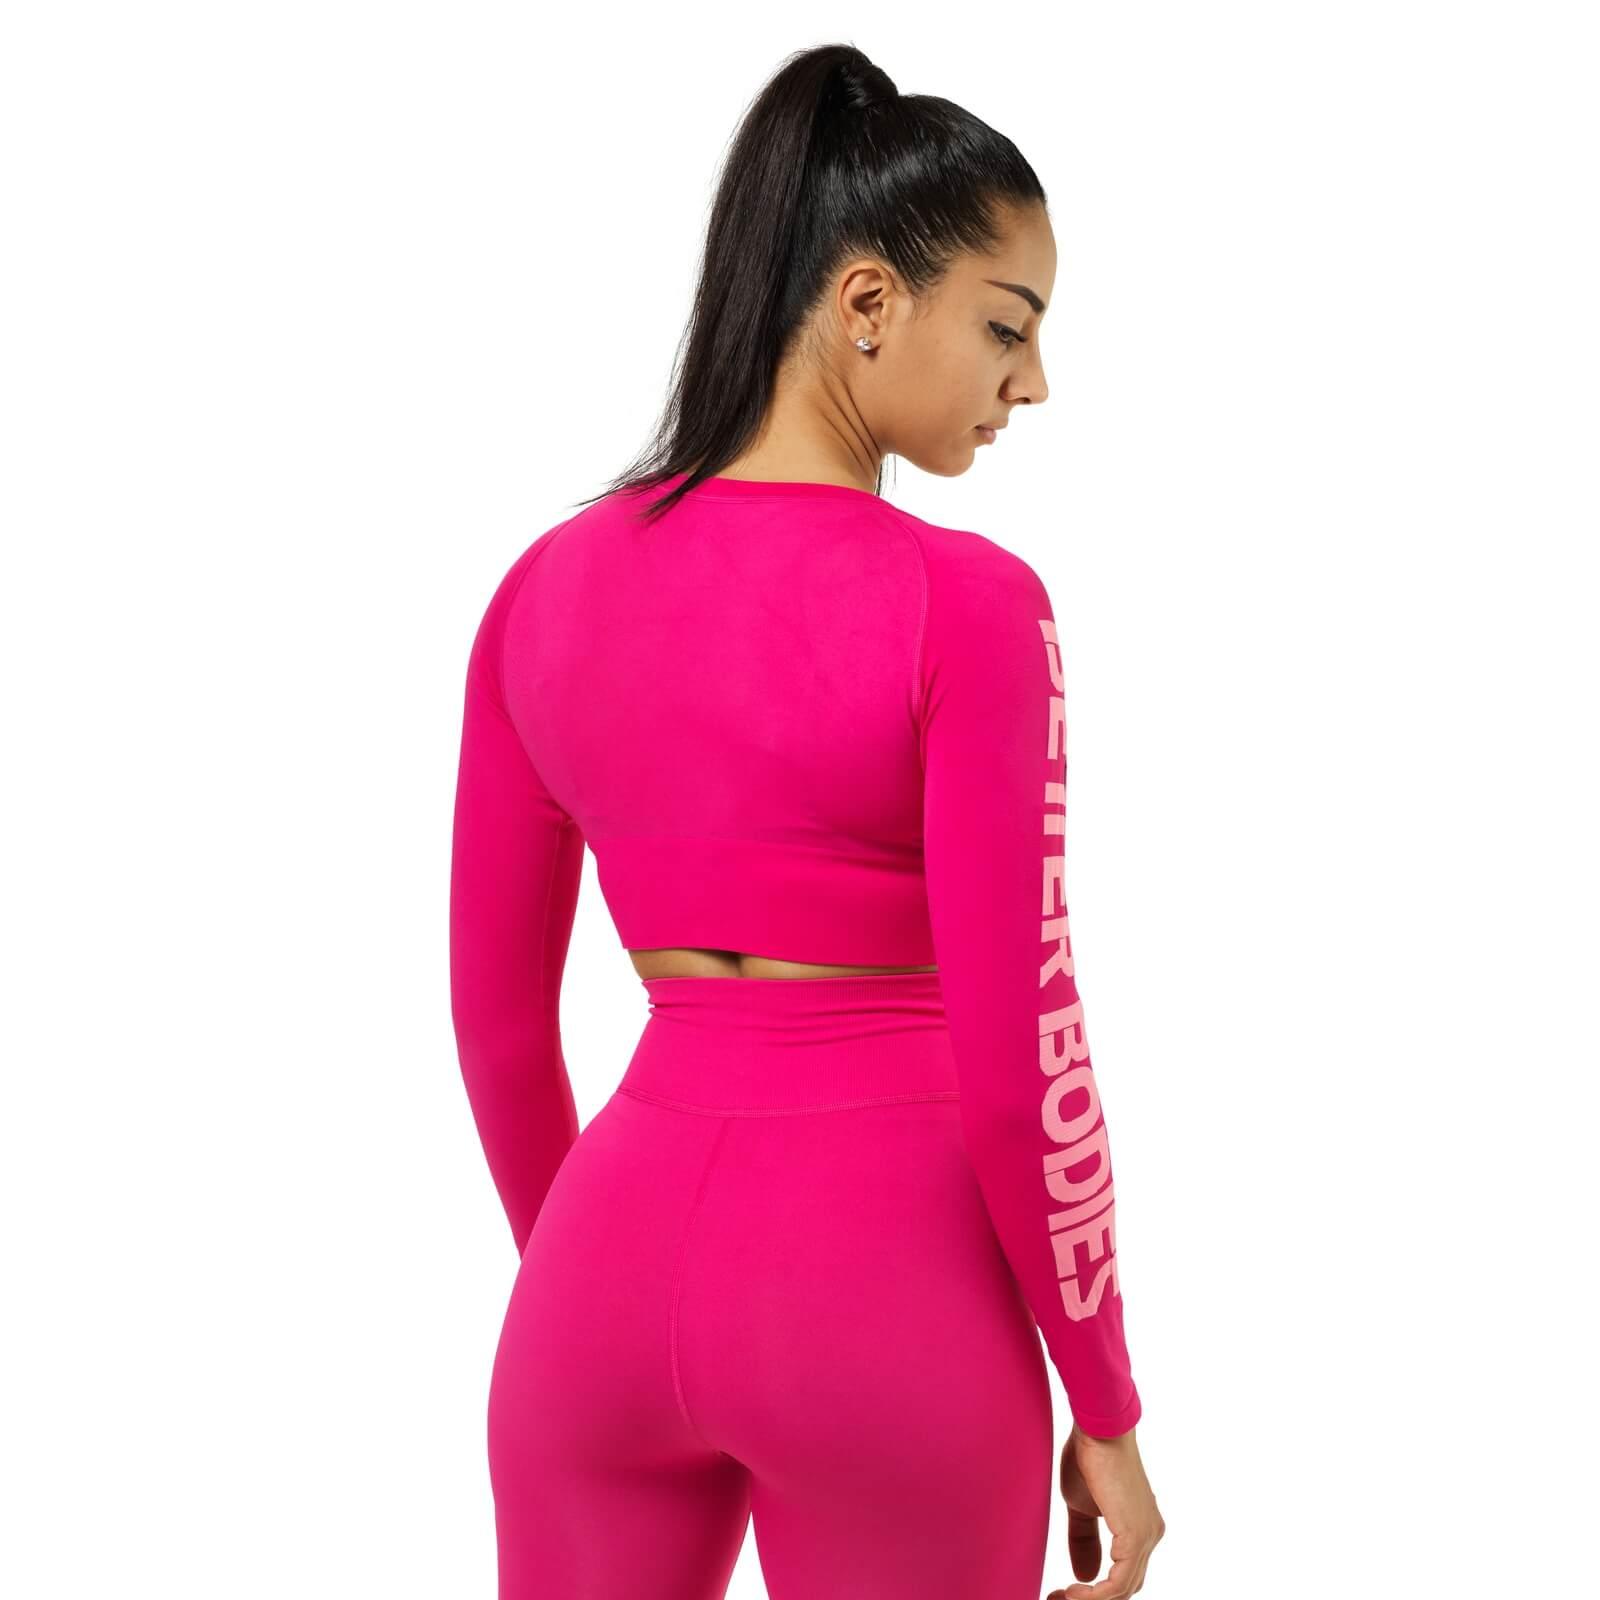 158c7465 Kjøp Bowery Cropped Ls, hot pink, Better Bodies online hos ...